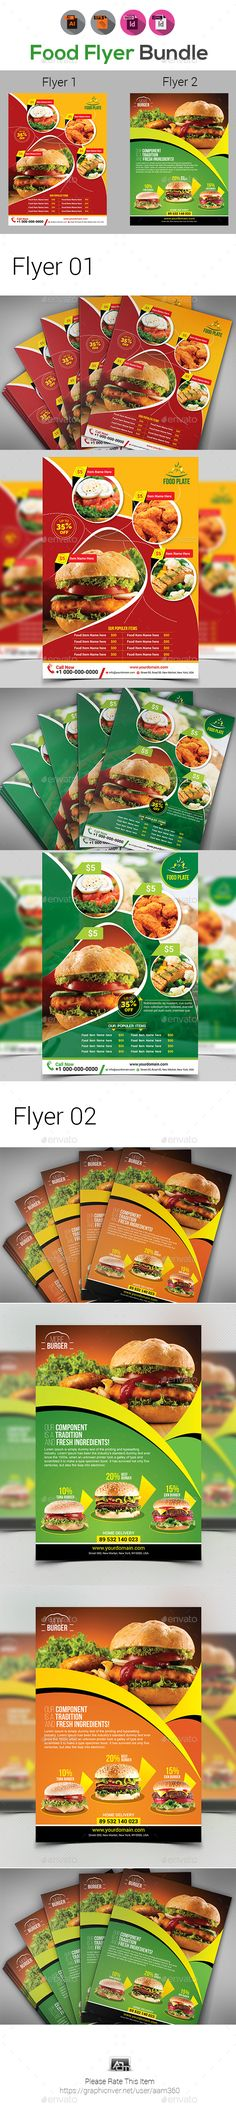 #Restaurant or #Food #Flyer Templates - Restaurant Flyers Download here:  https://graphicriver.net/item/restaurant-or-food-flyer-templates/20426287?ref=alena994